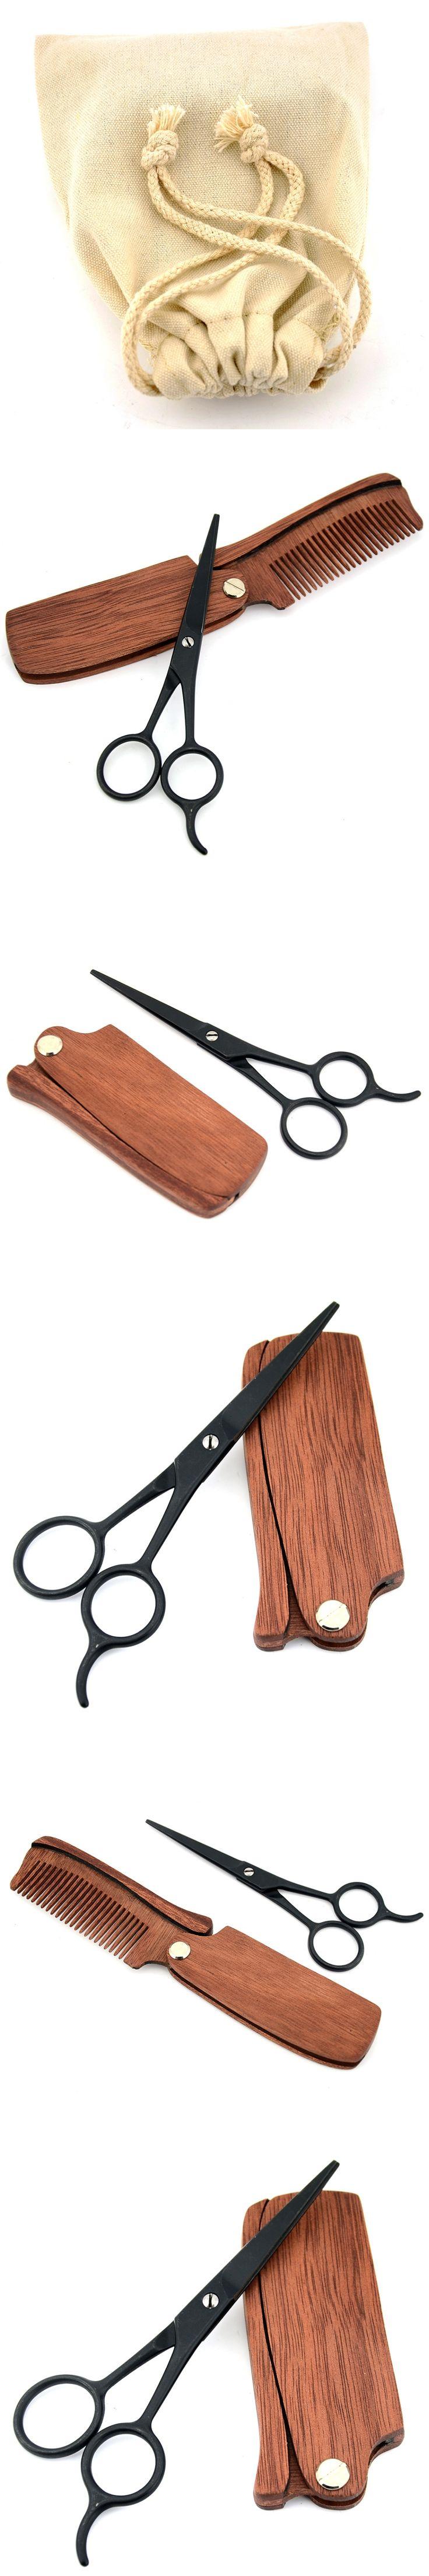 2PCS ZY 4.5 inch Beard Scissors Mustache Hair Trimmer Black Shaving Shears For Men Shave Beard + Folding Comb+Free Canvas Bag